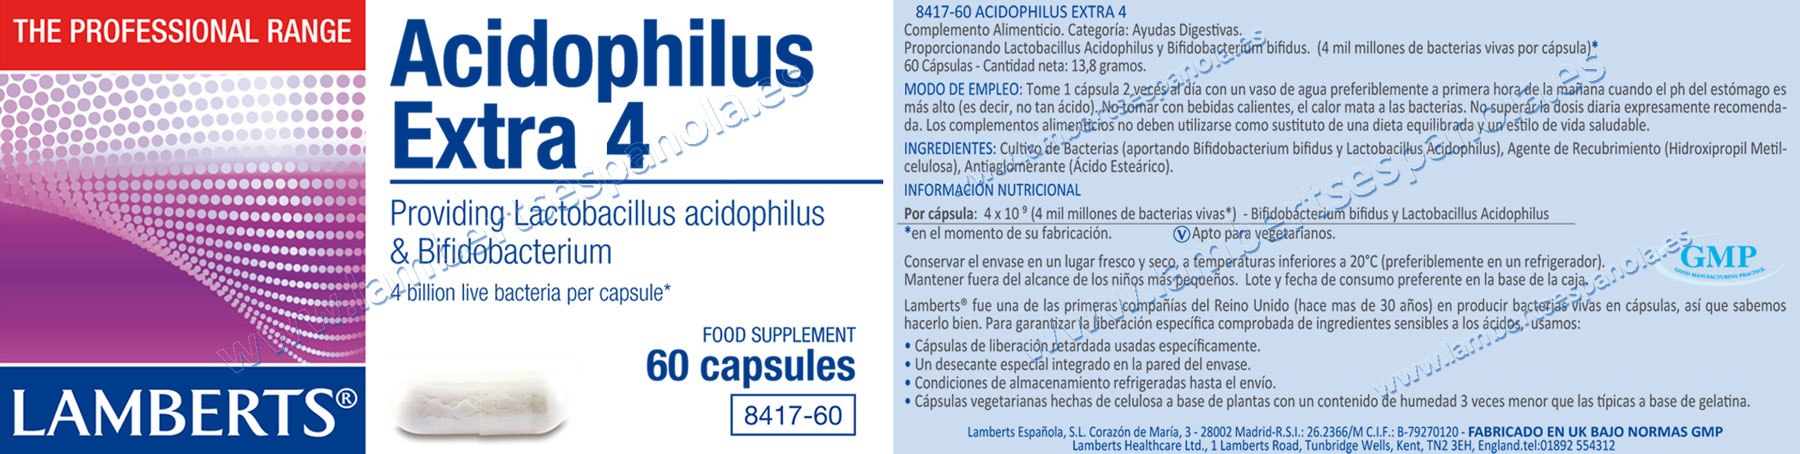 Probióticos acidófilus